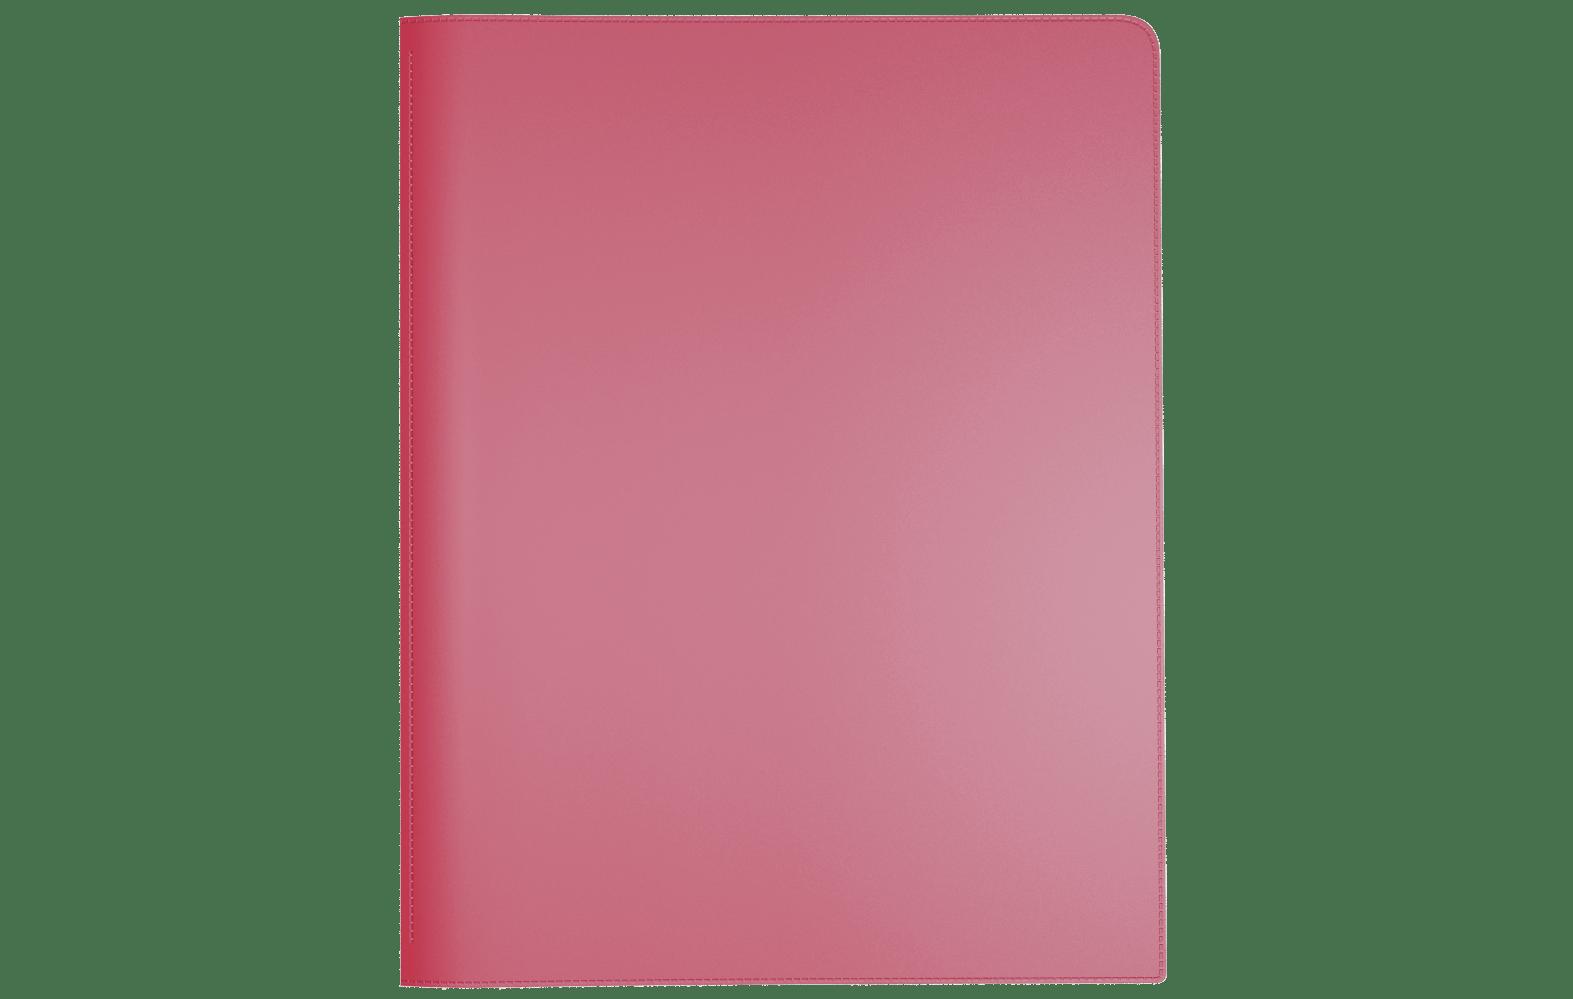 katie s folder rochester